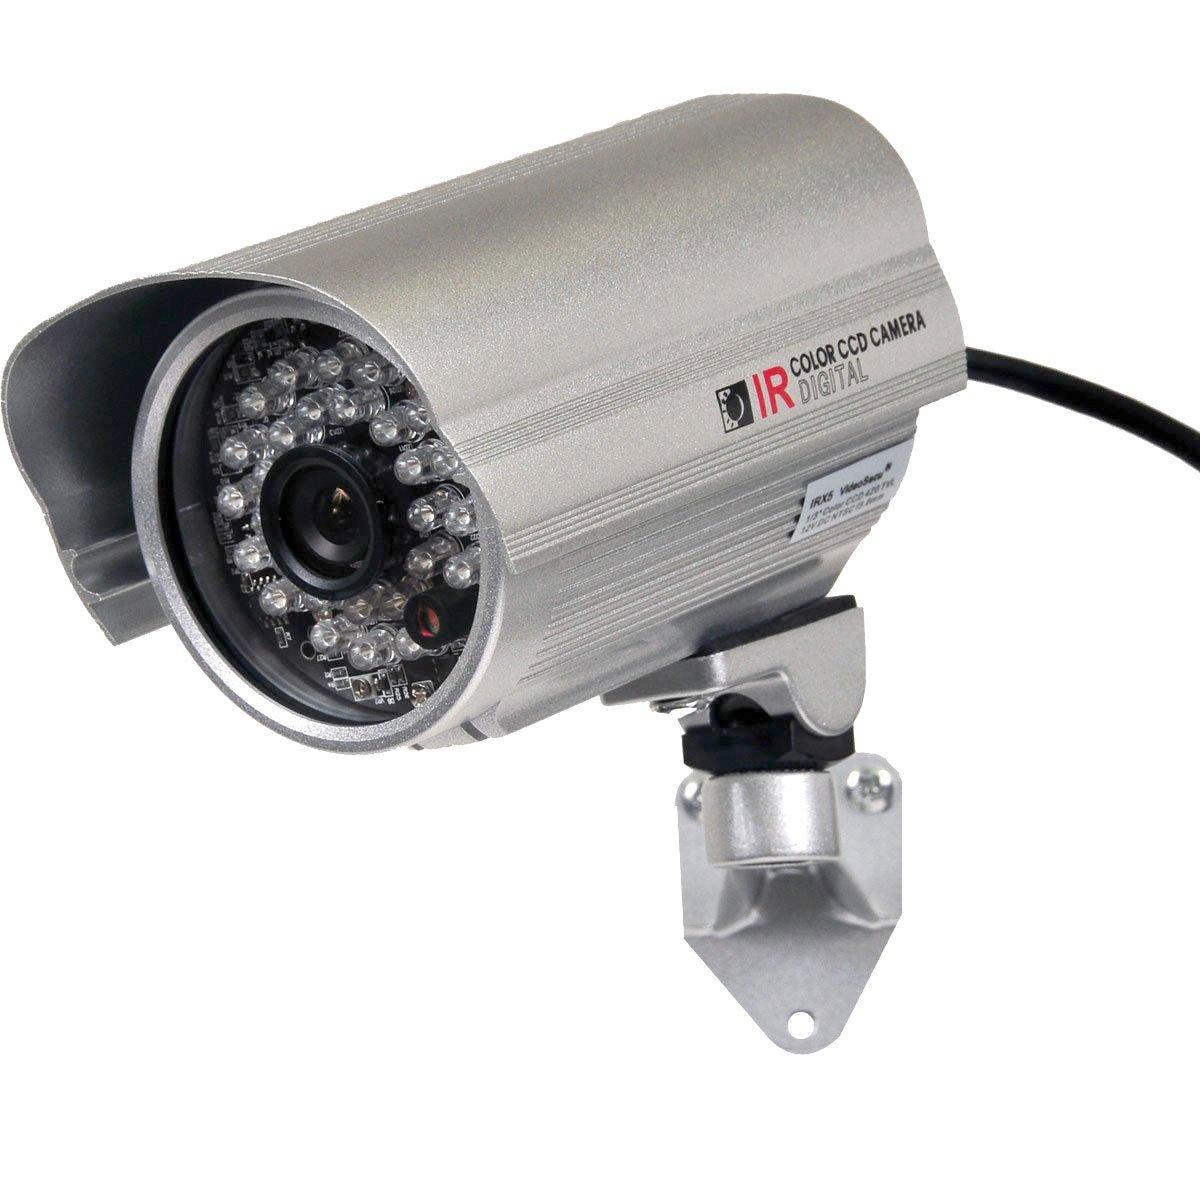 Amazon.com : VideoSecu Bullet Security Camera Outdoor Day Night IR ...